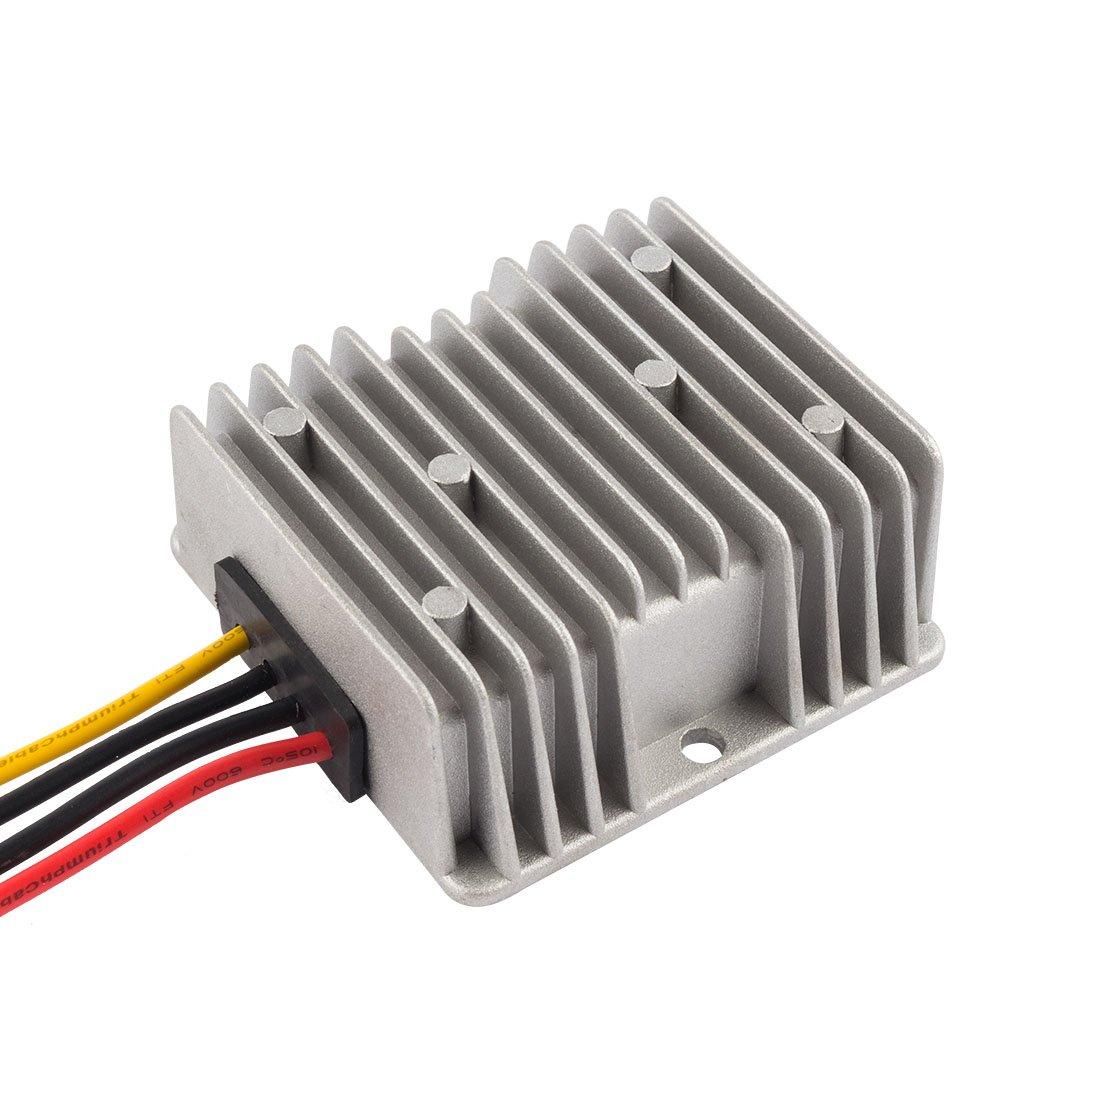 Step-Up to DC19V 6A 114W Waterproof Voltage Convert Transformer 10V~16V uxcell Power Converter Regulator DC12V